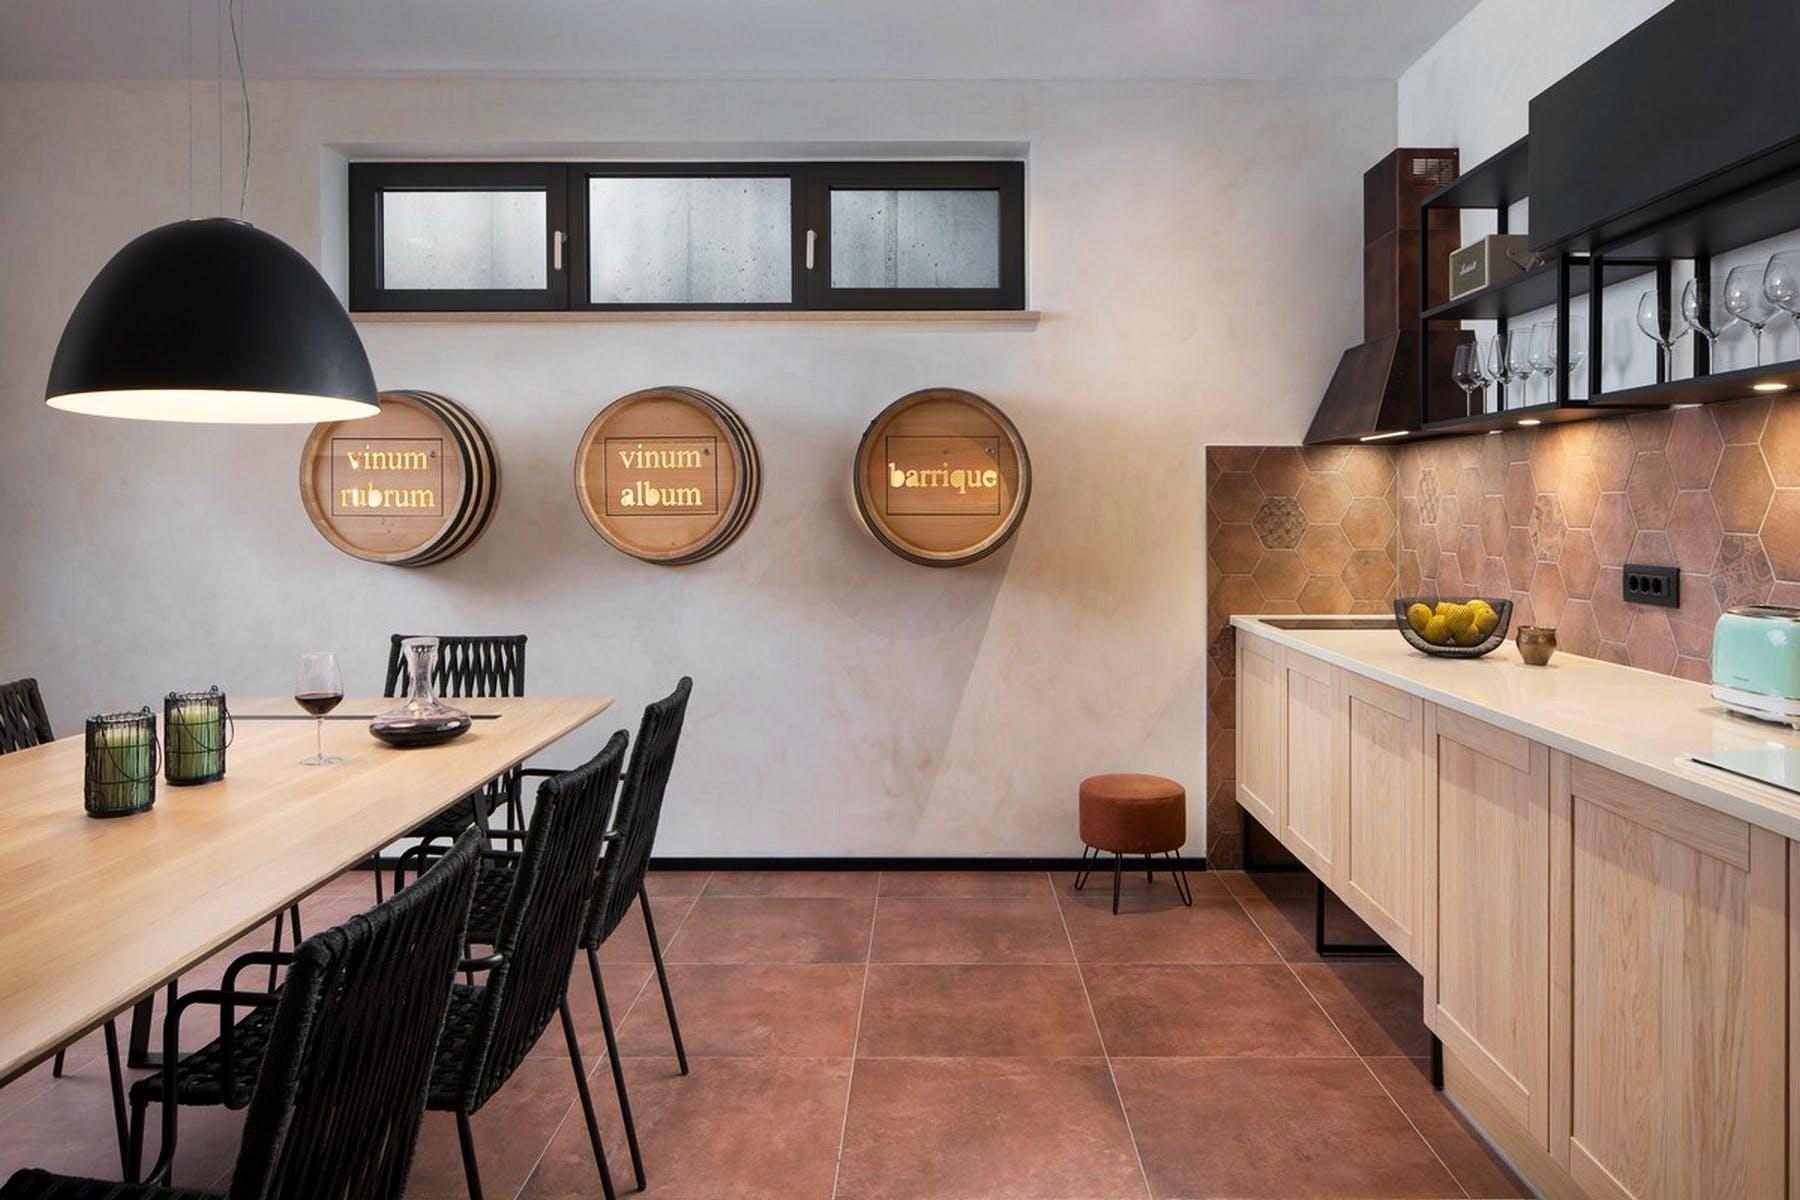 High-end interior design